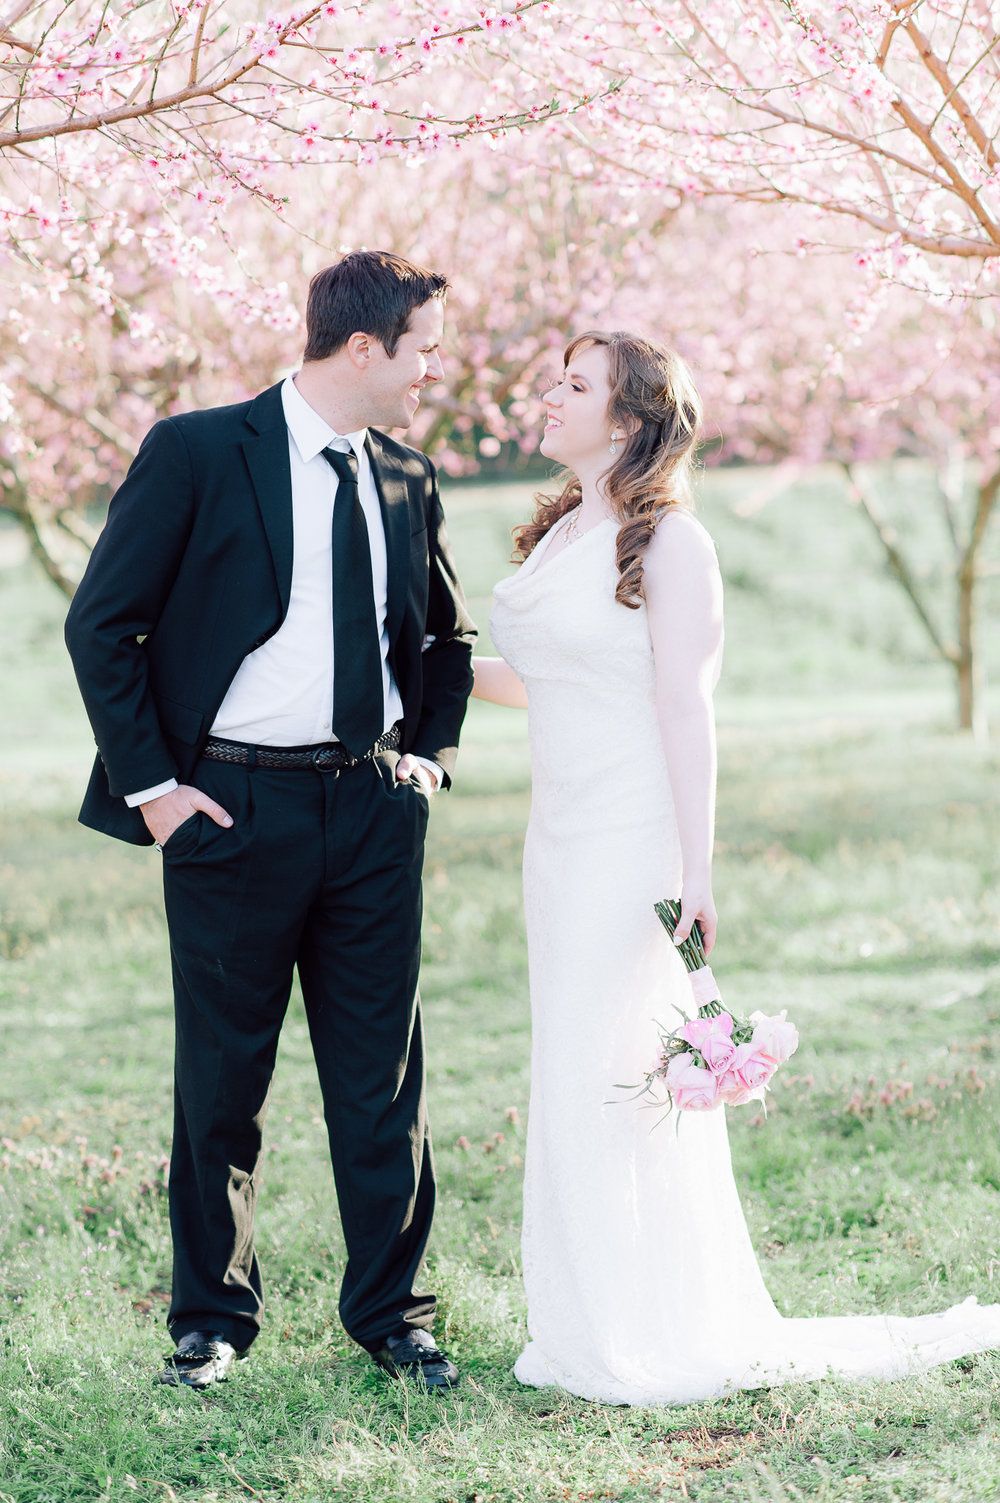 springwedding_cherryblossoms_virginiaphotographer_youseephotography_styledshoot (565).jpg